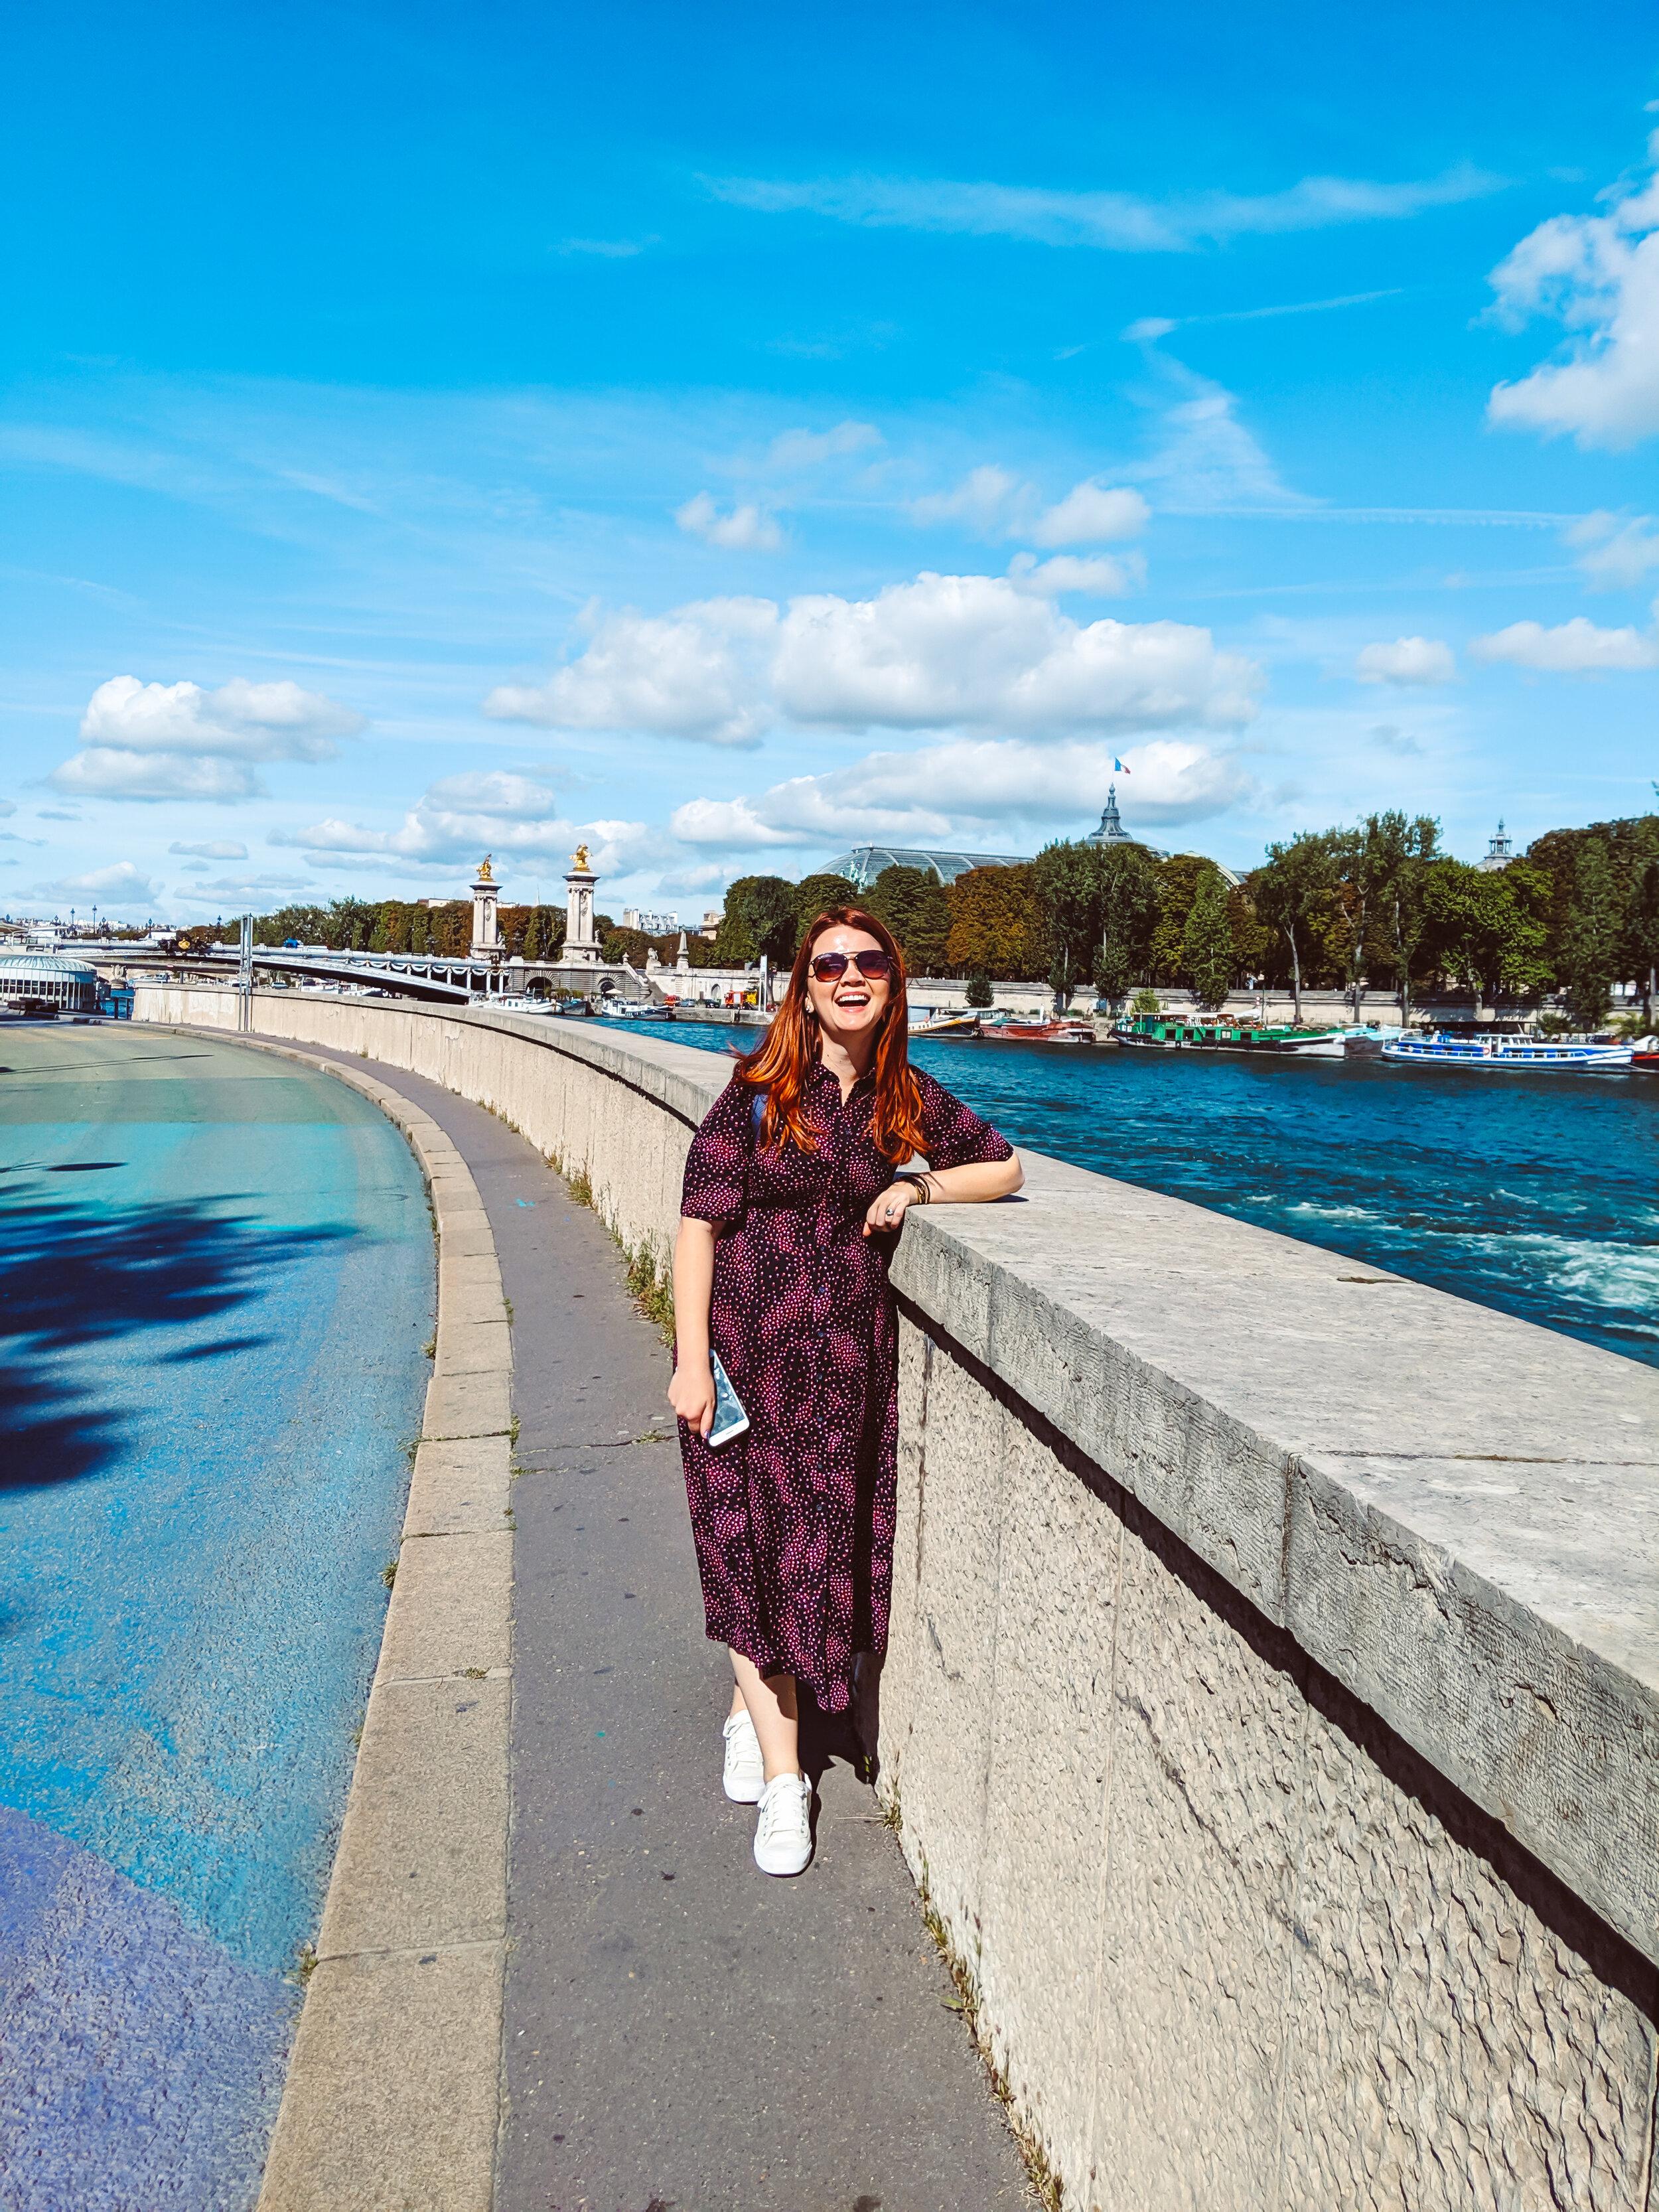 Walking the Seine to the Eiffel Tower!